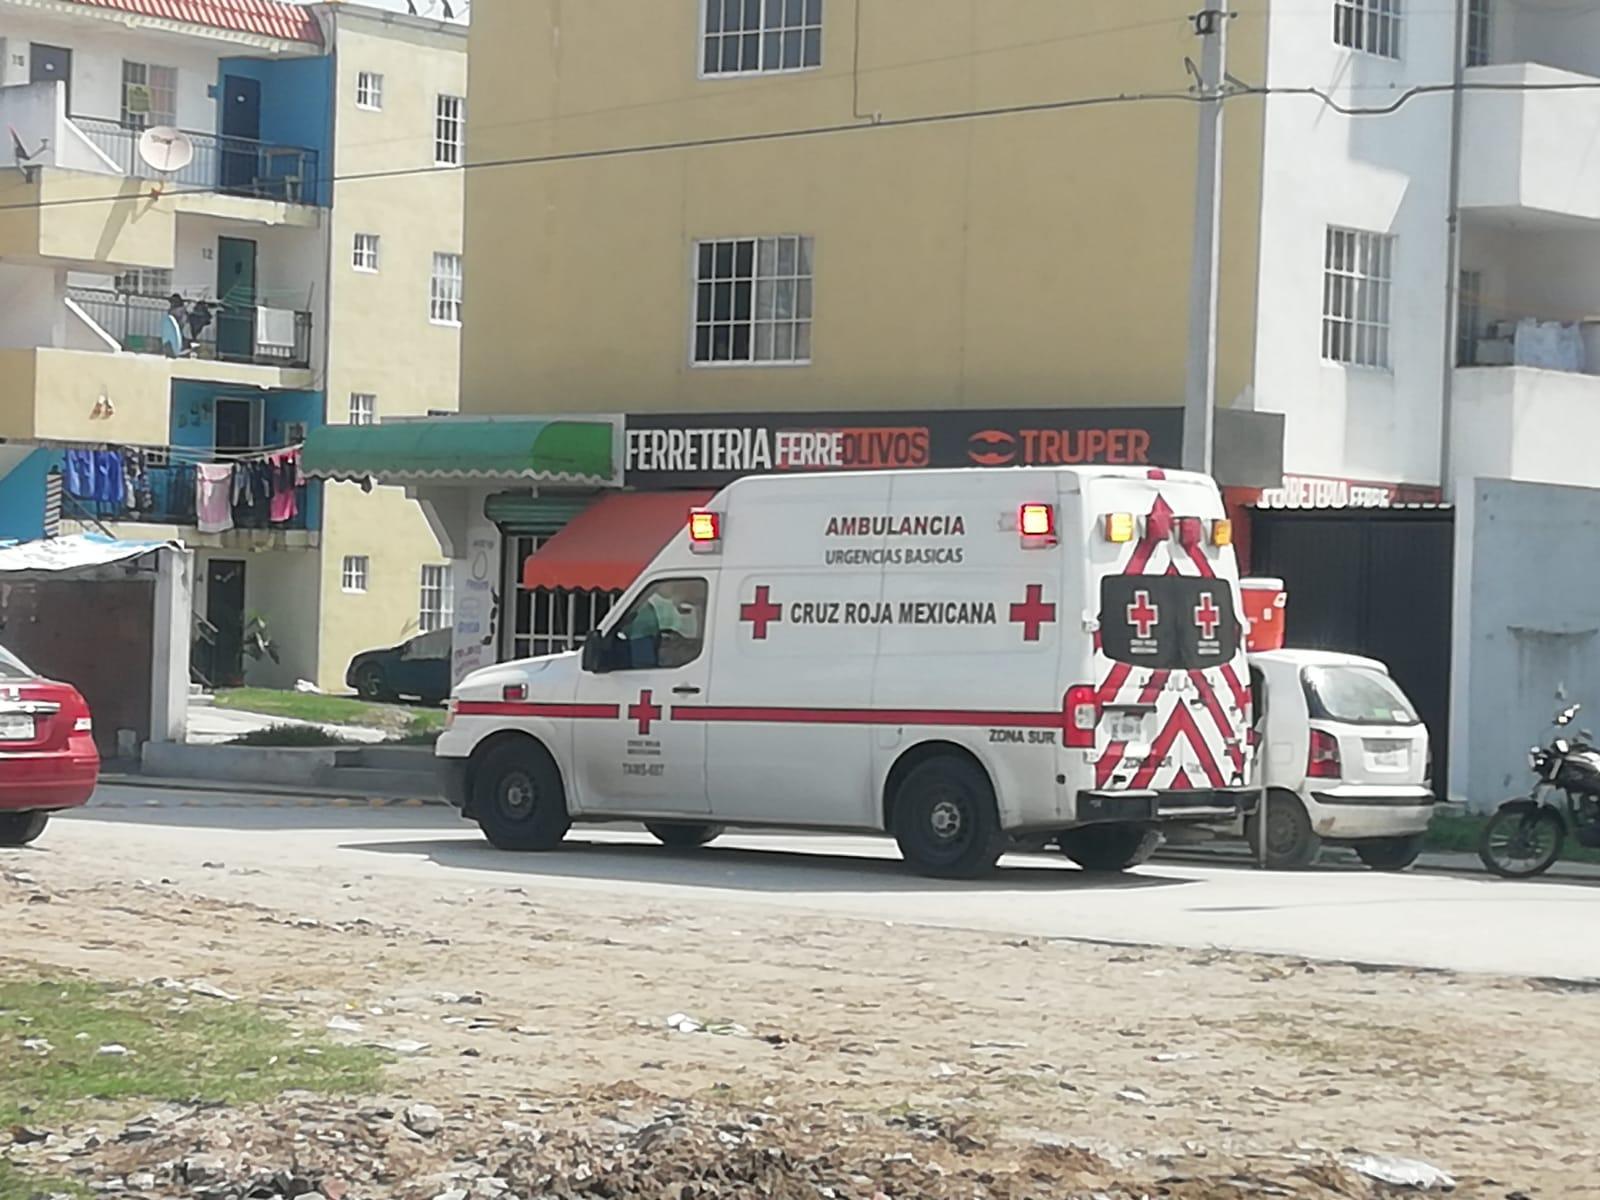 Da Cruz Roja